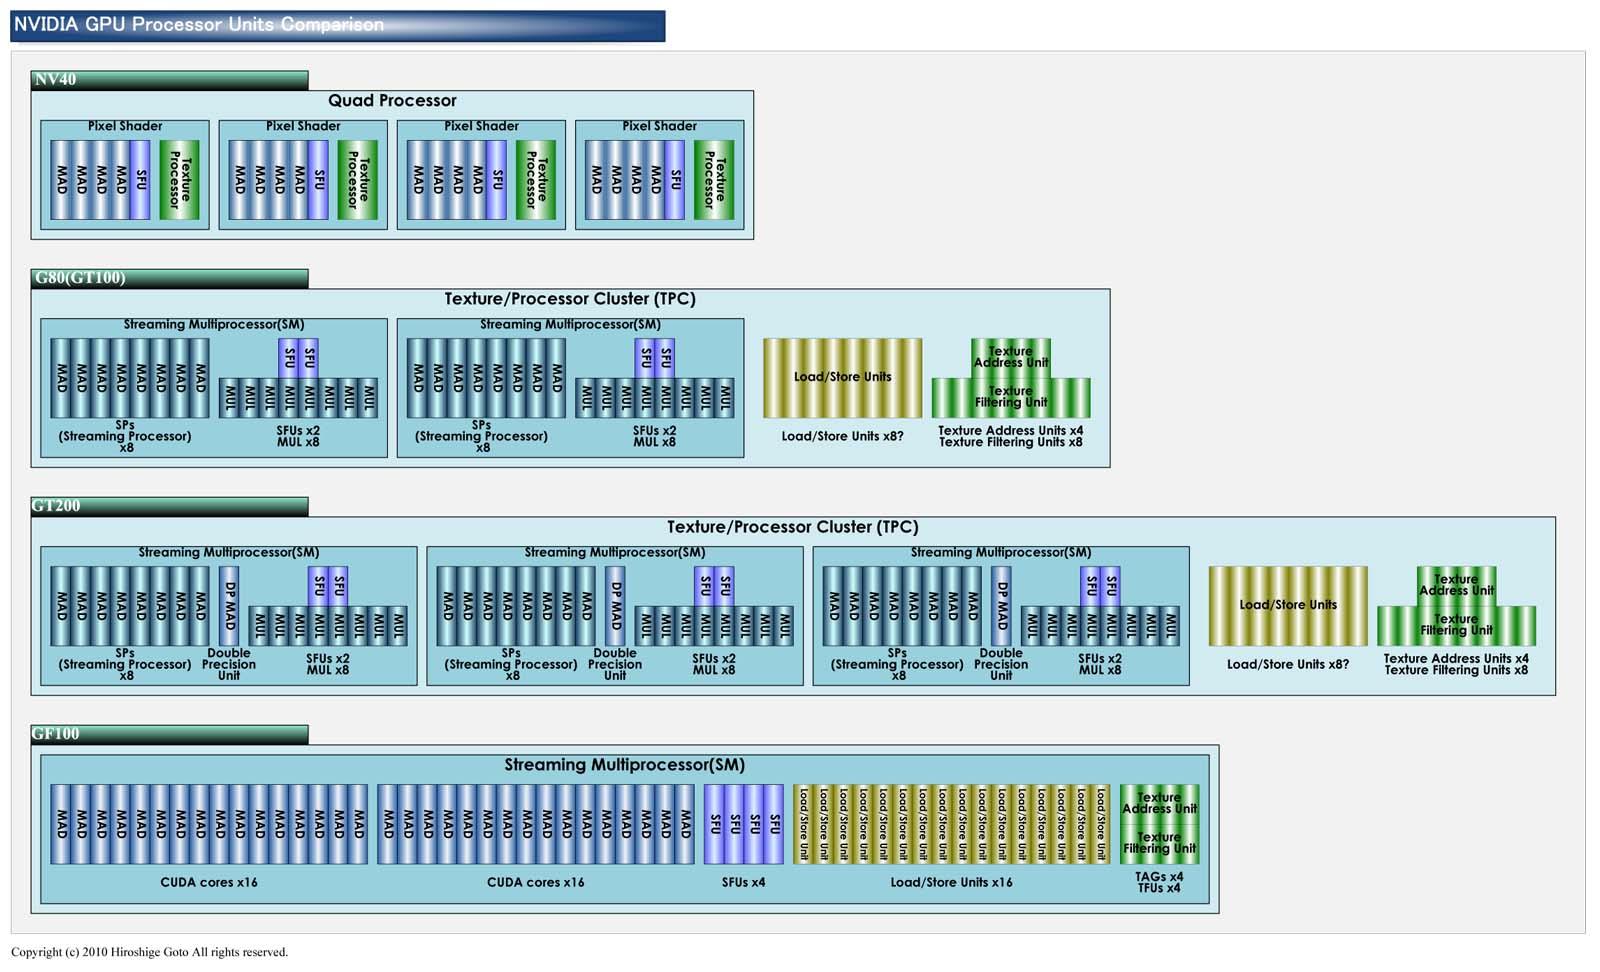 "Fermi、G80、NV40のProcessor Clusterのユニット数比較<br>PDF版は<a class=""resource"" ipw_status=""2"" ipw_linktype=""filelink_raw"" ipw_id=""789959"" href=""/video/pcw/docs/378/869/p04.pdf"">こちら</a>"